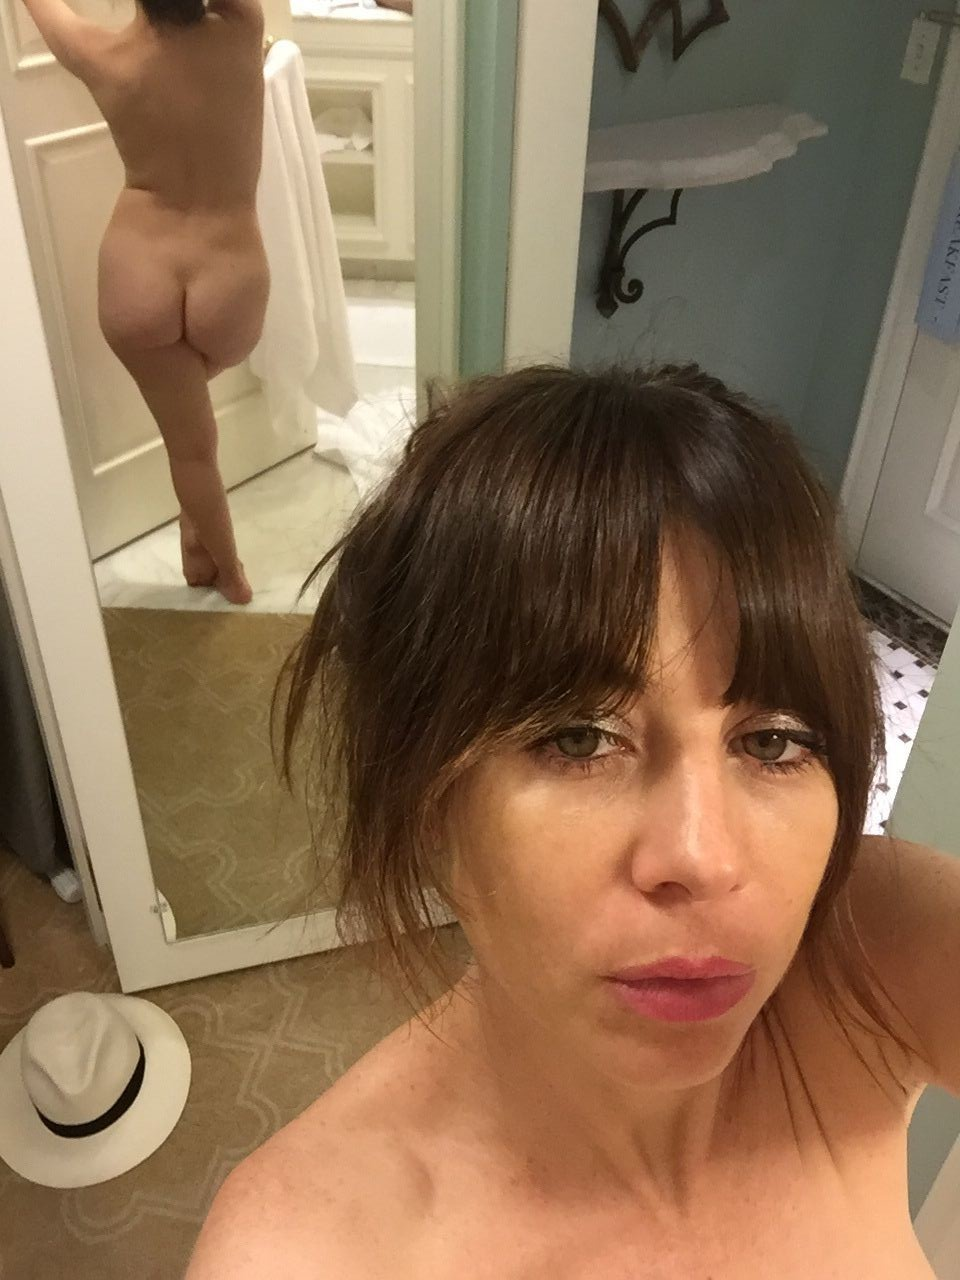 Natasha-Leggero-Nude-TheFappening-9.jpg